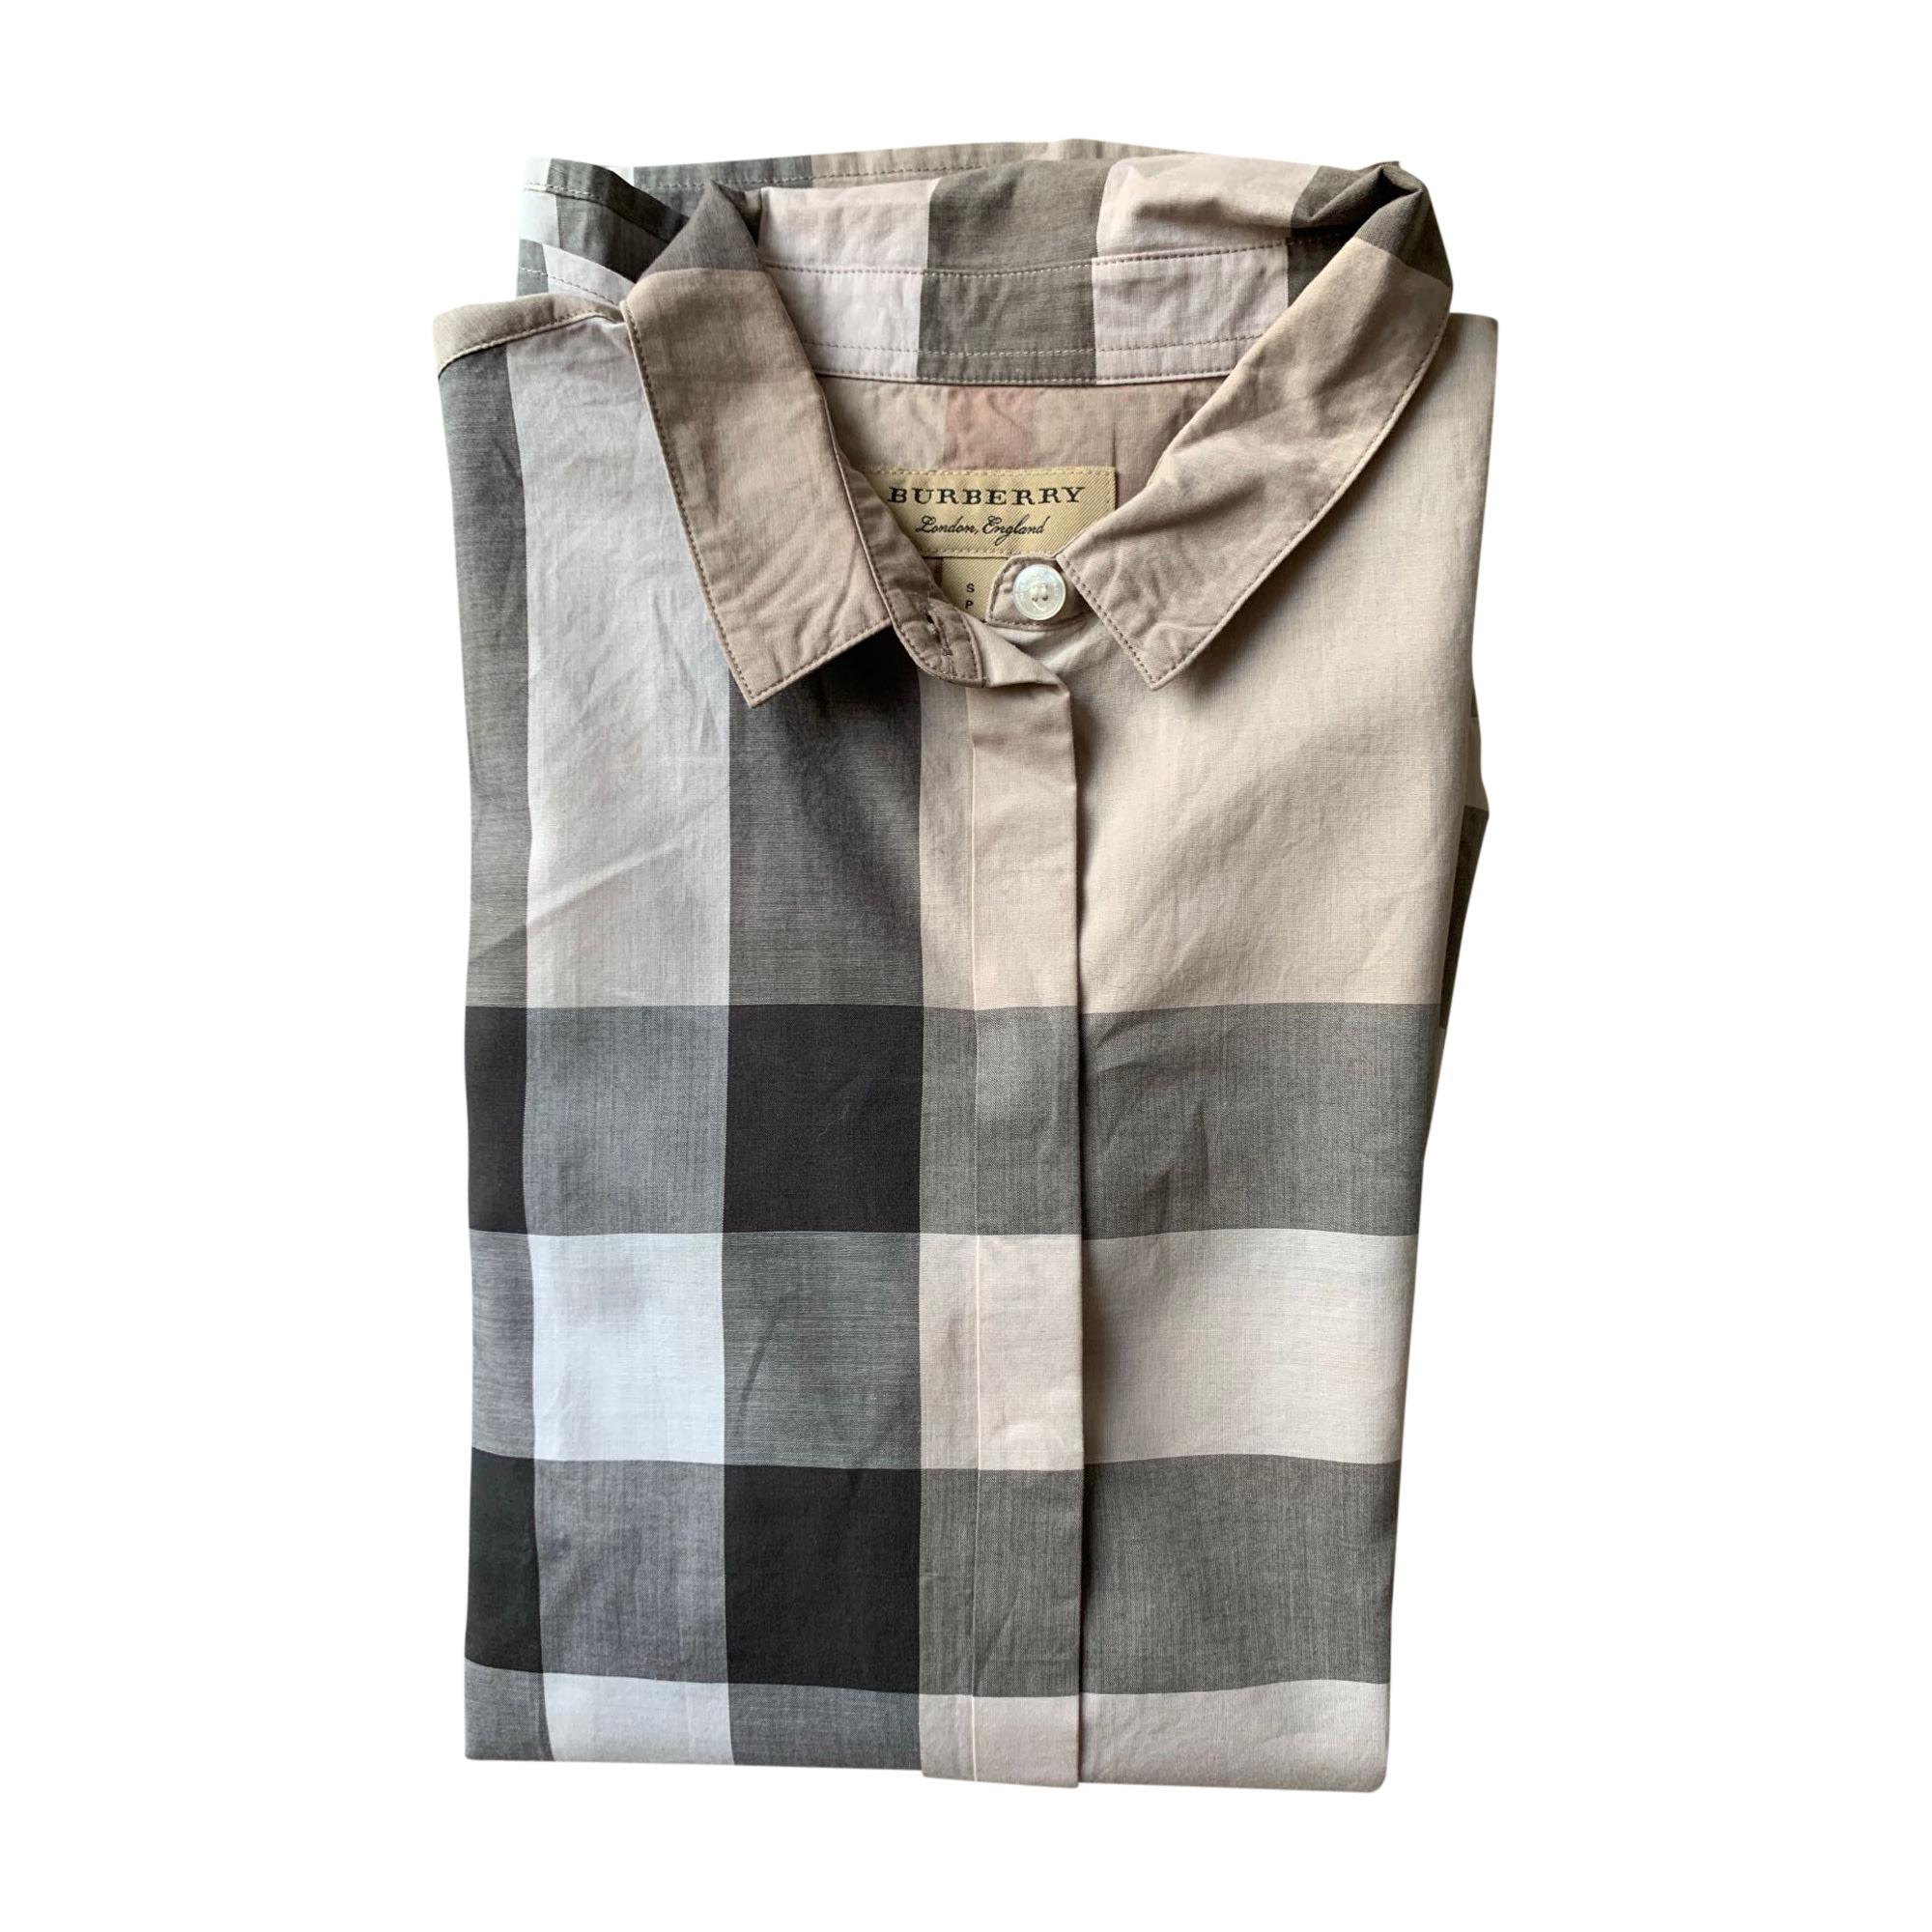 Shirt BURBERRY Gray, charcoal